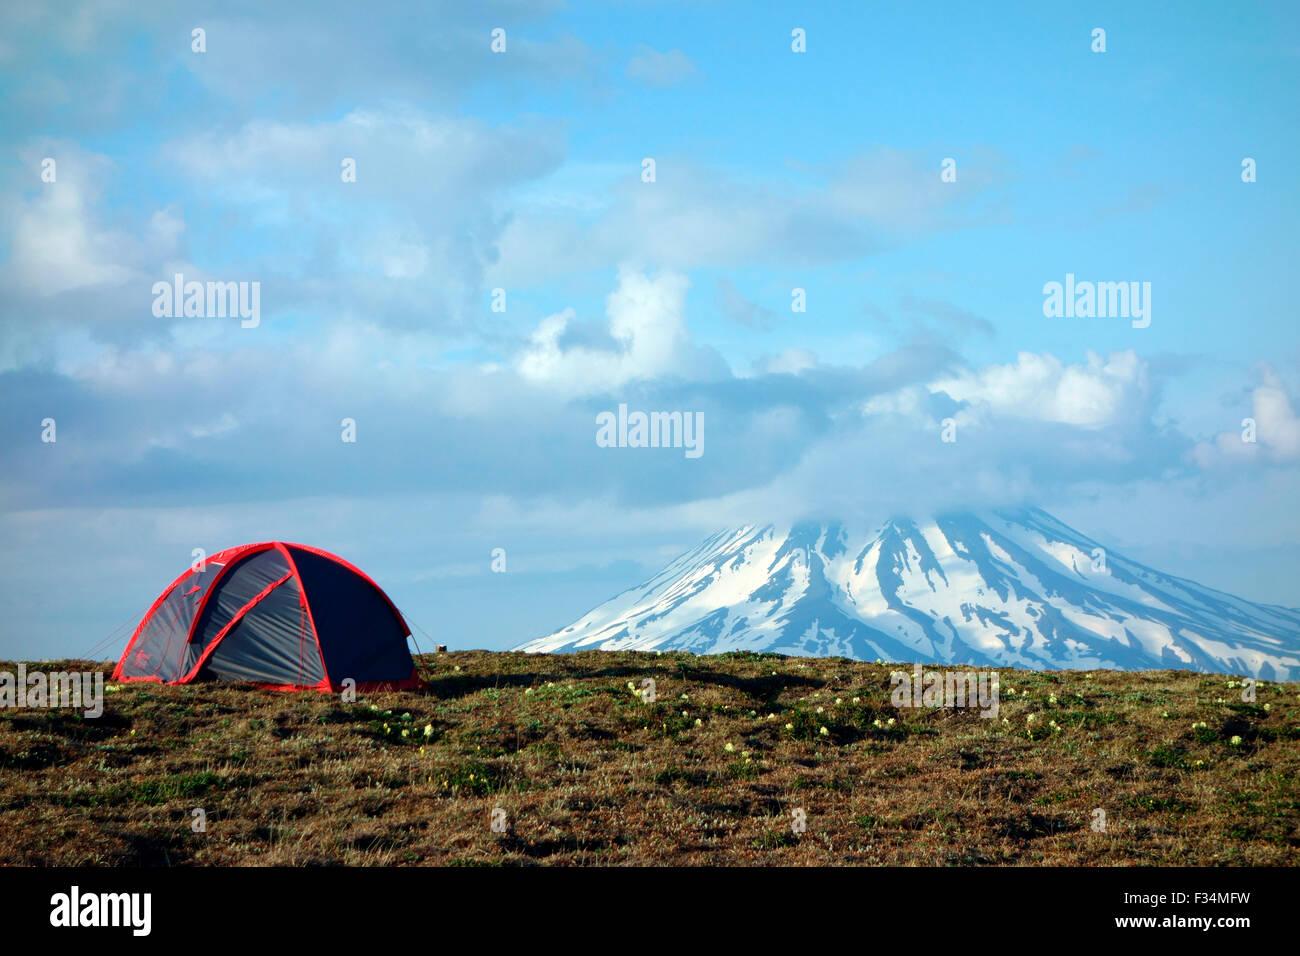 Camping below Vilyuchinsky volcano, Kamchatka Peninsula, Russia - Stock Image